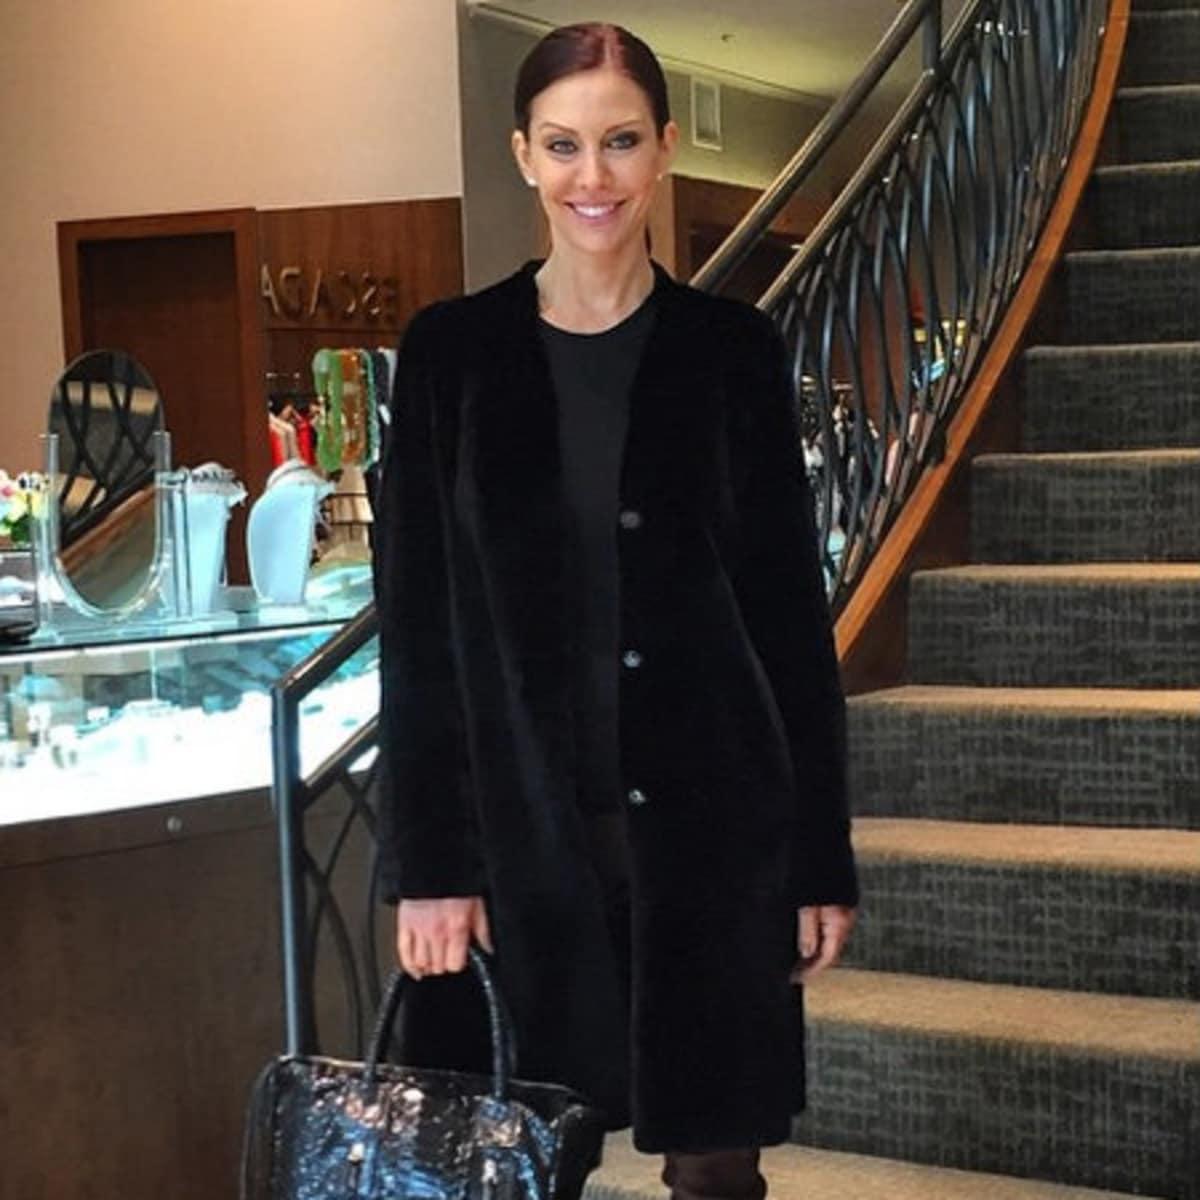 Model in outfit and Carlos Falchi handbag at Elizabeth Anthony